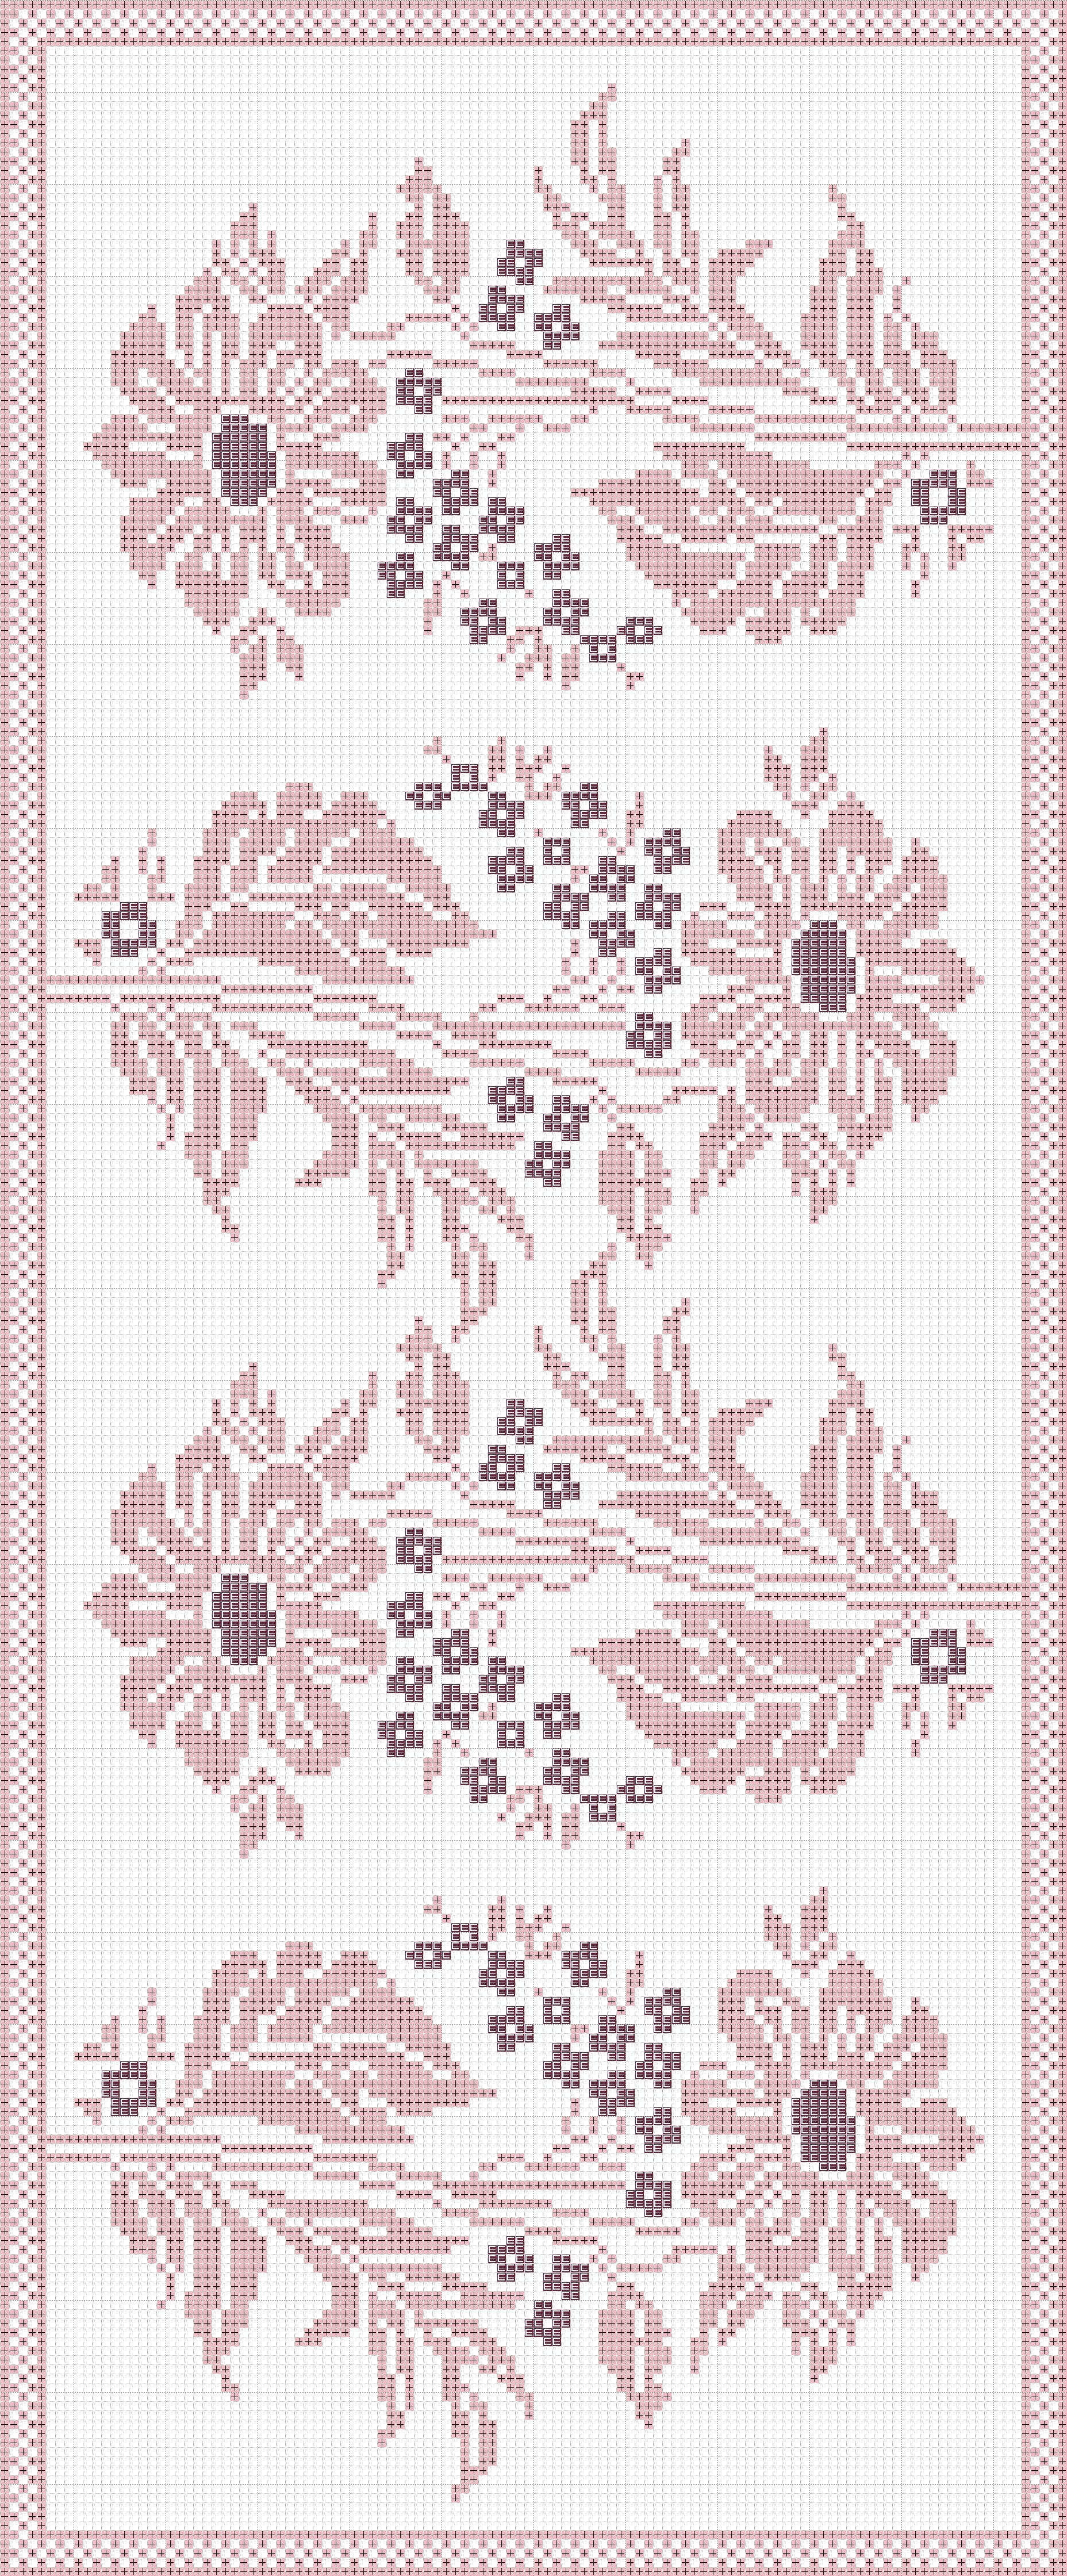 Pin de Davrose Austin en Cross stitch | Pinterest | Punto de cruz ...